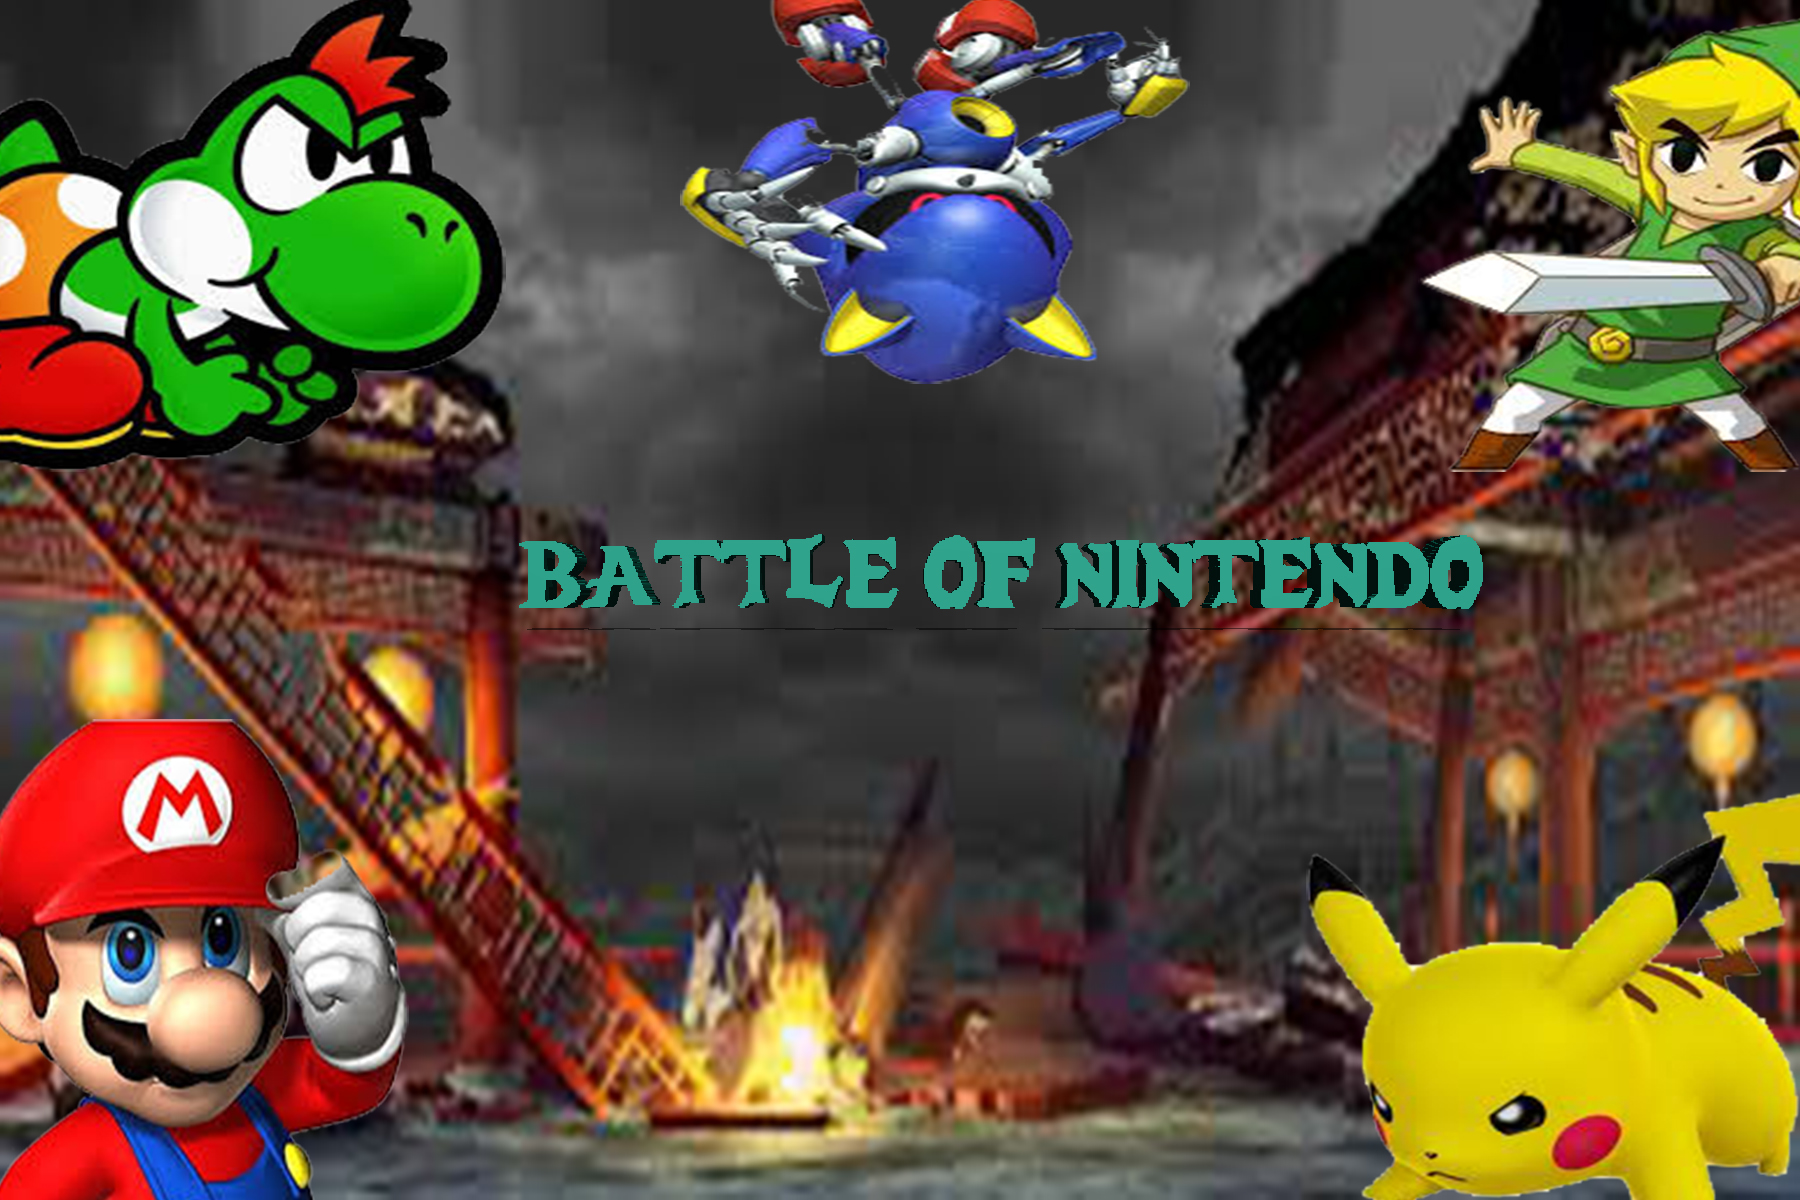 Battle of Nintendo